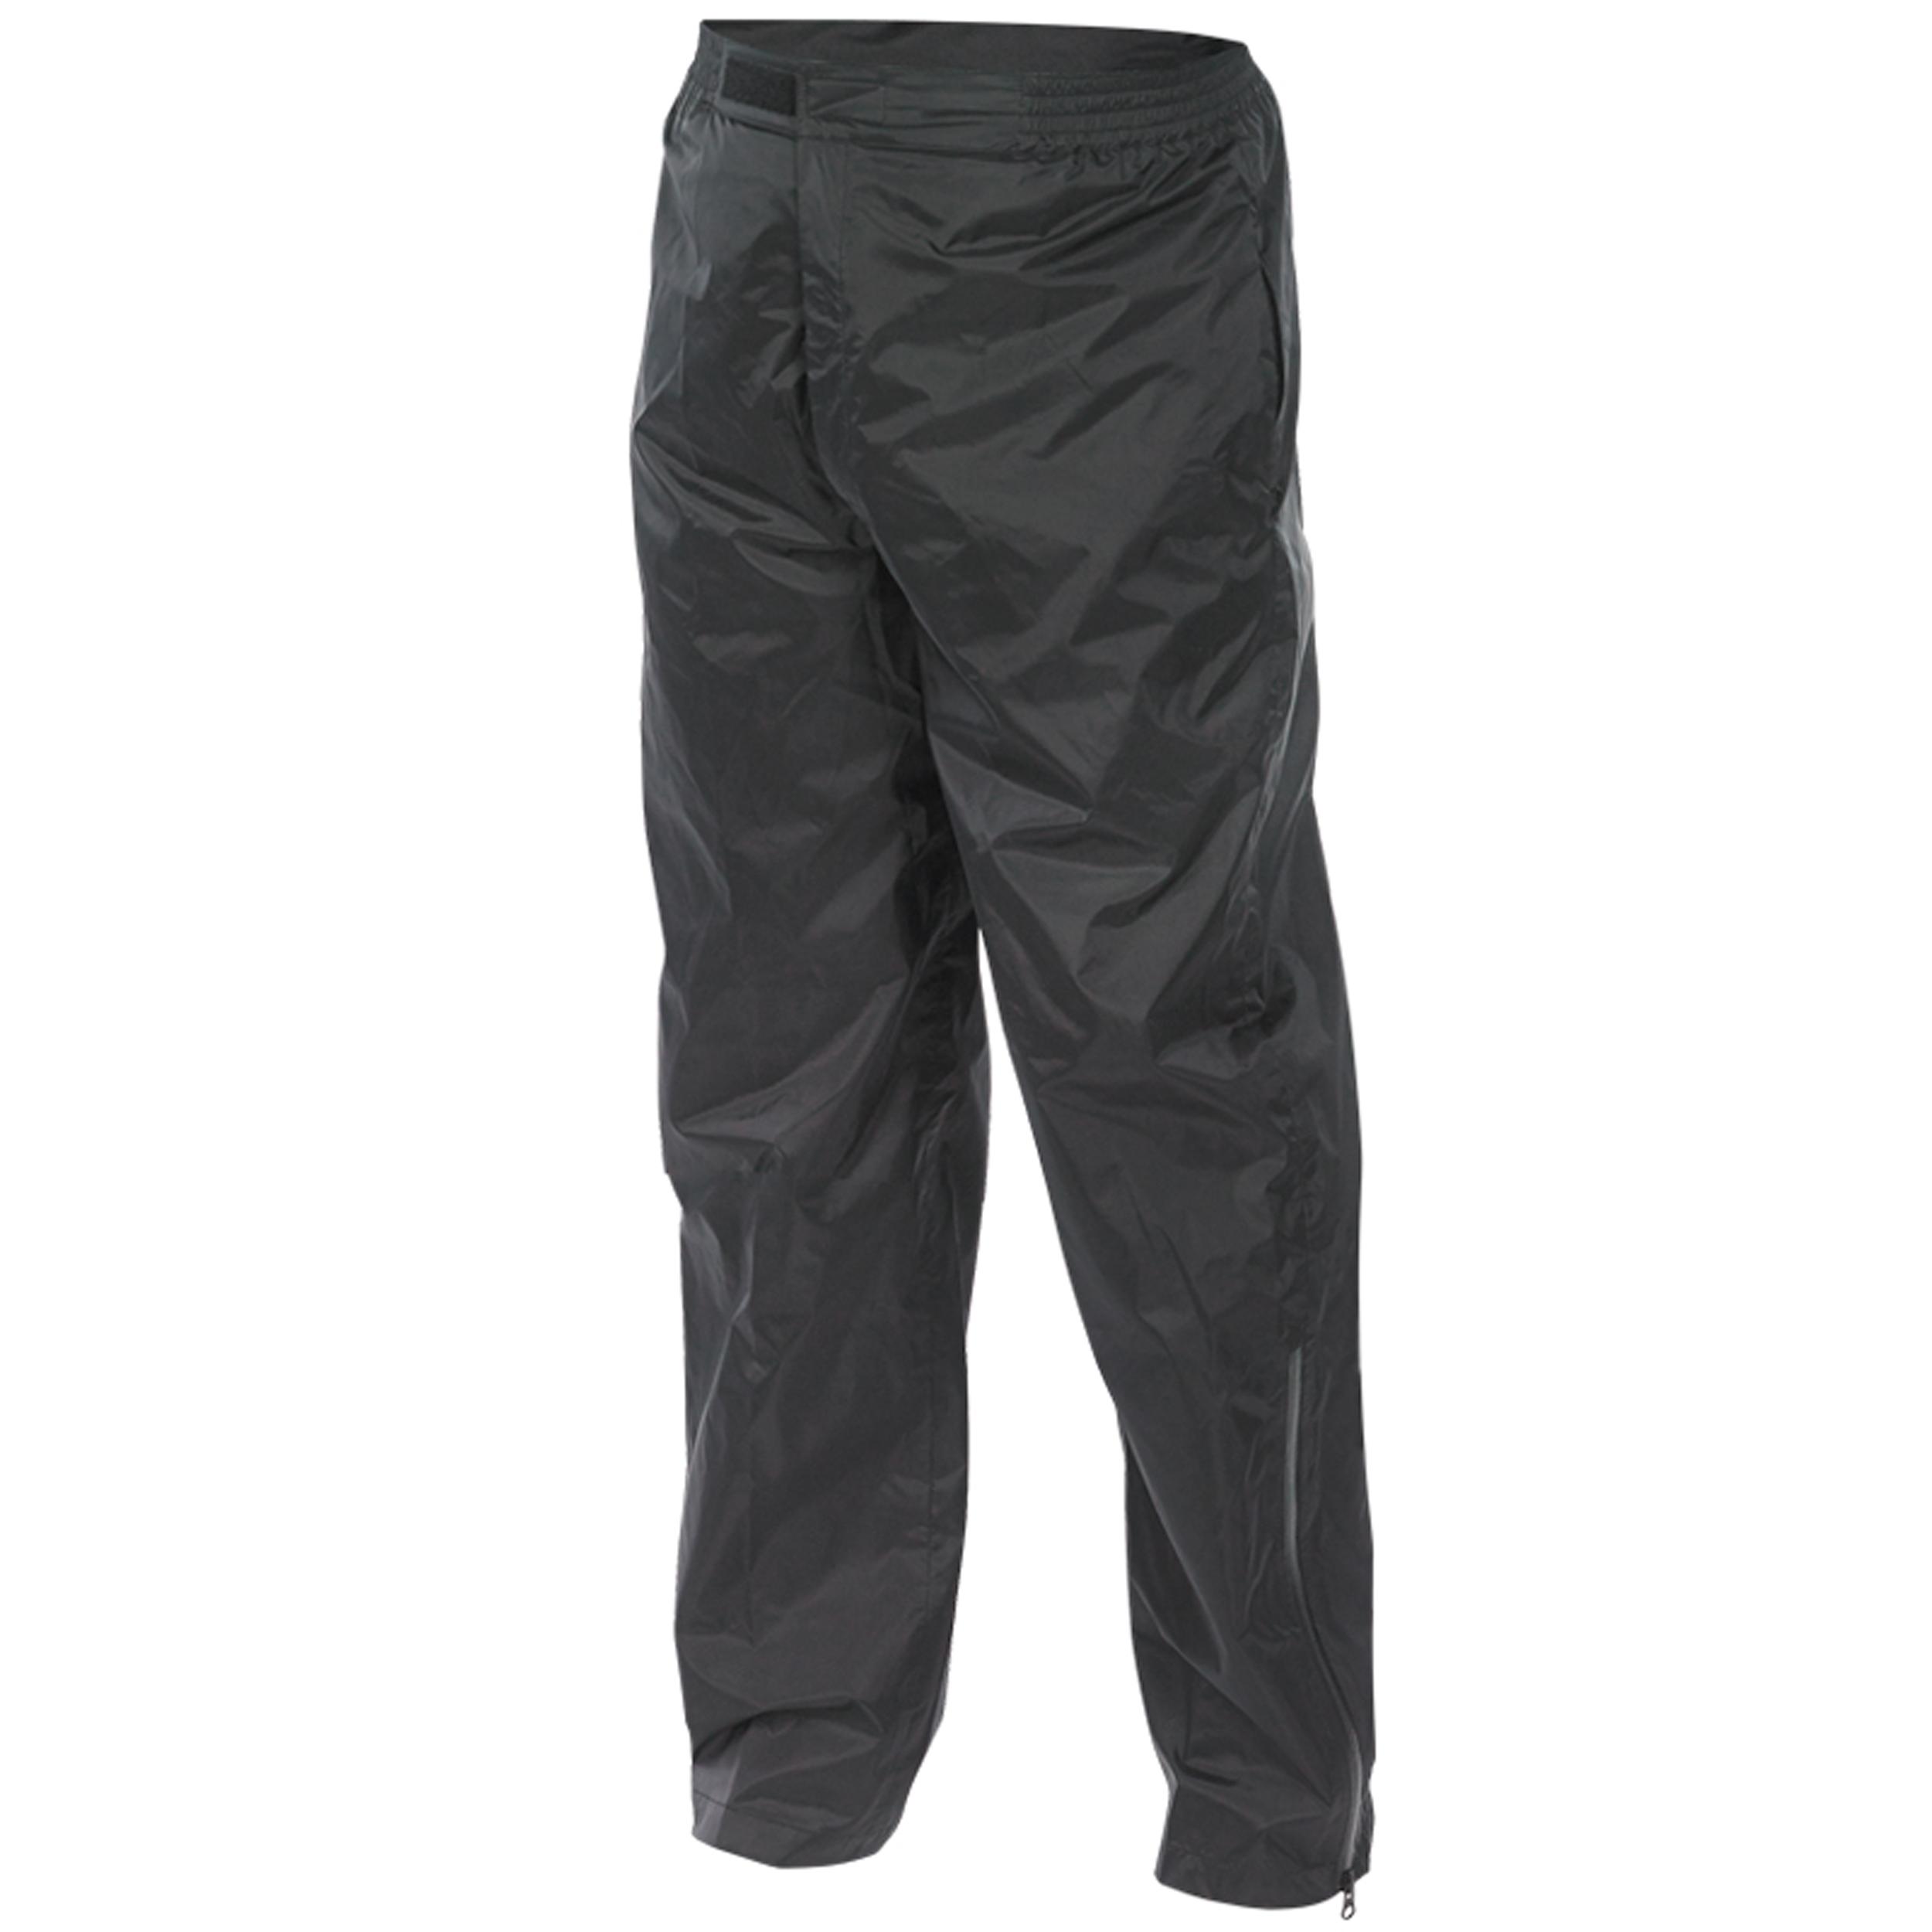 Snugpak Rp1 Rain Pants Black Xxl